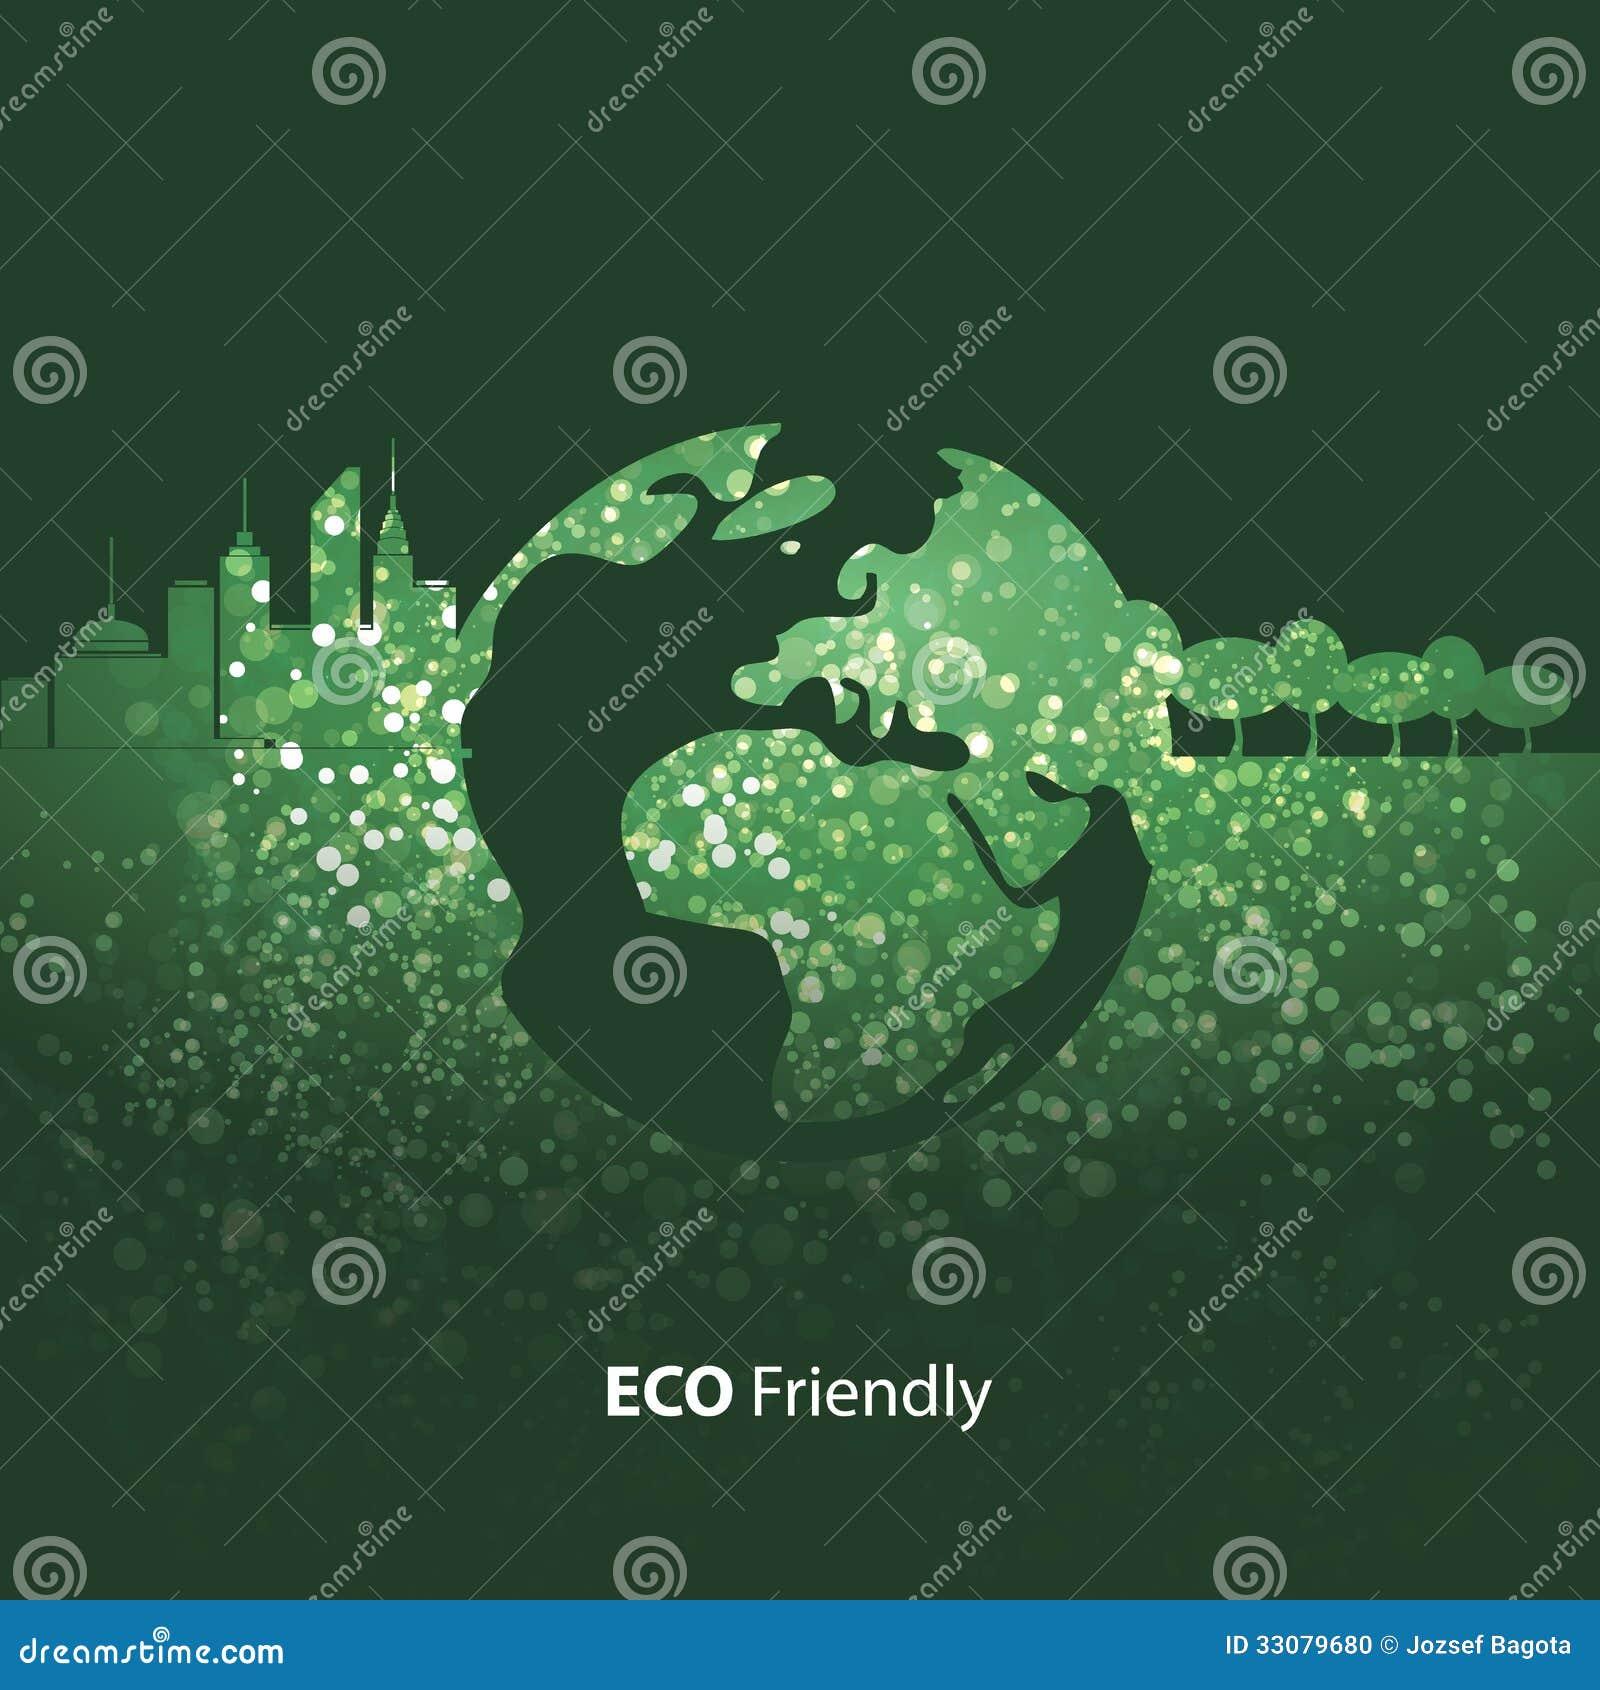 Development of environmentally friendly amphicar